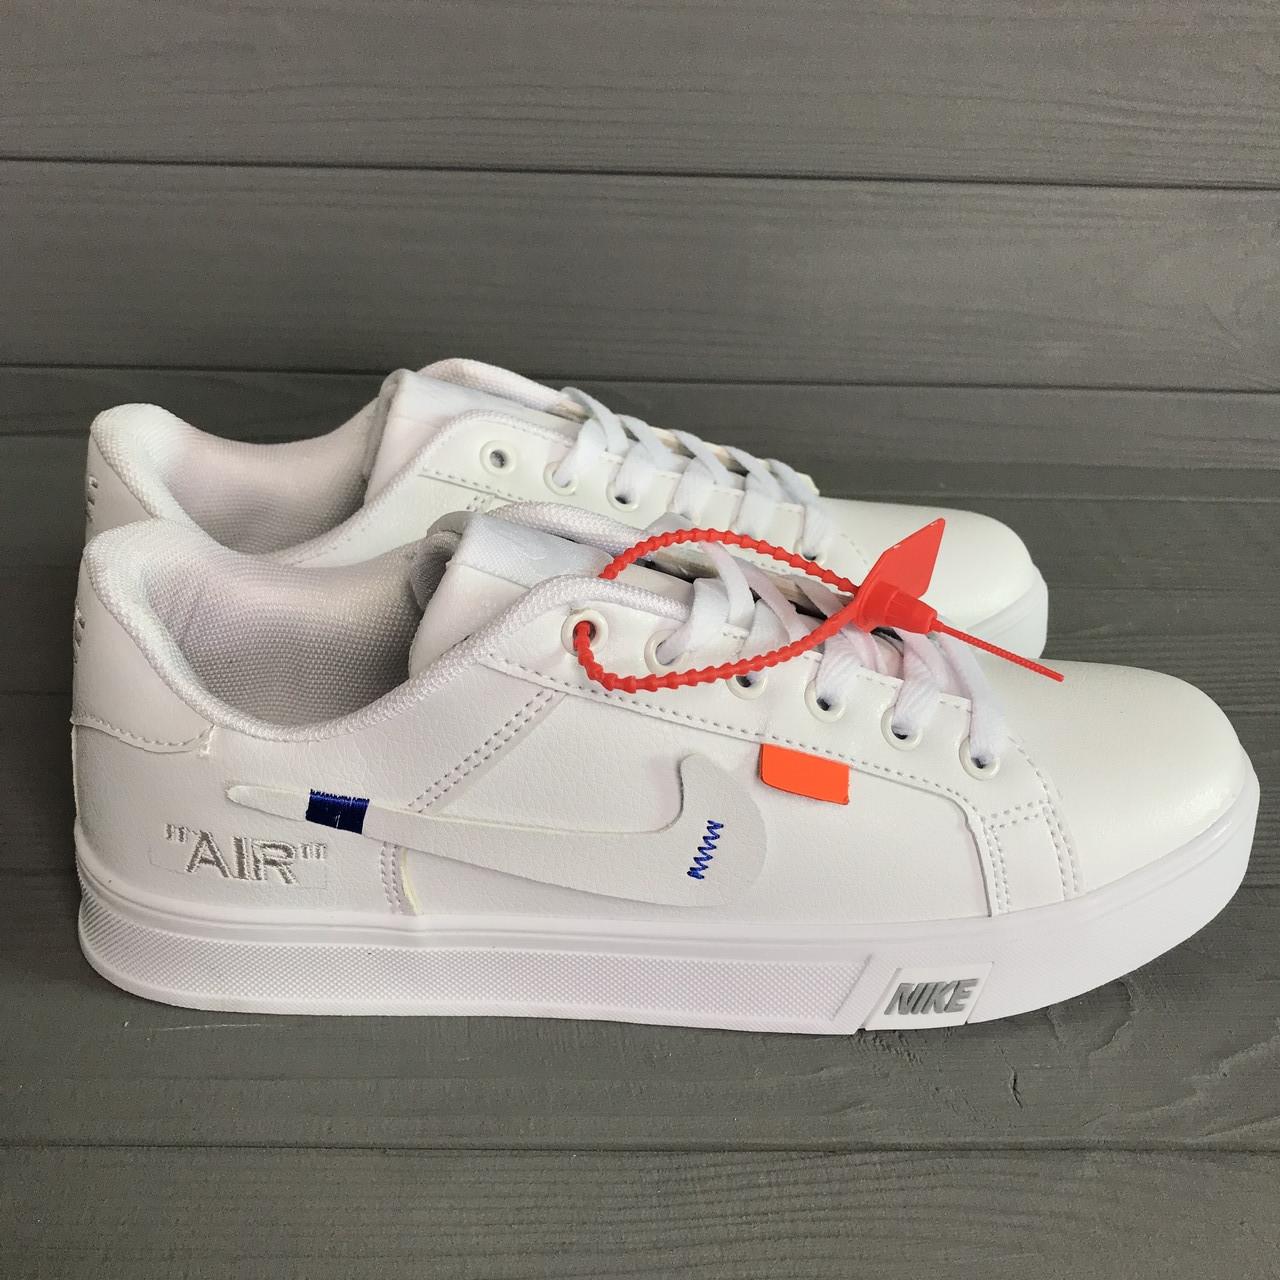 Кроссовки найк аир женские белые демисезонные (реплика) Nike Air xOFF White